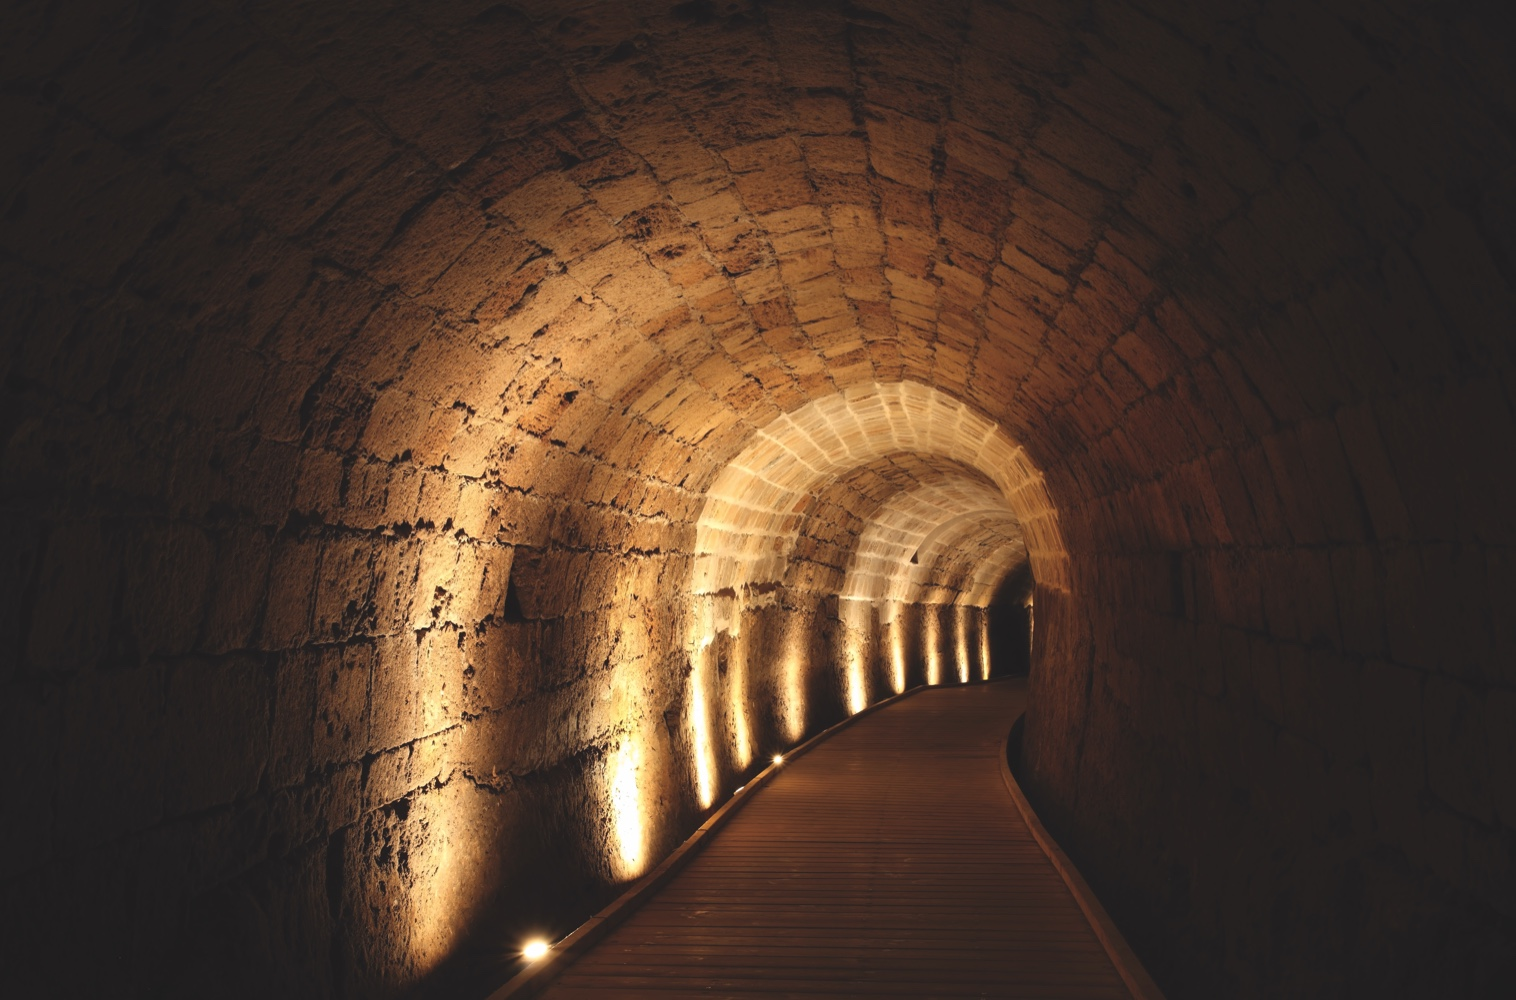 Acre knight templar tunnel, Israel; Shutterstock ID 37361170